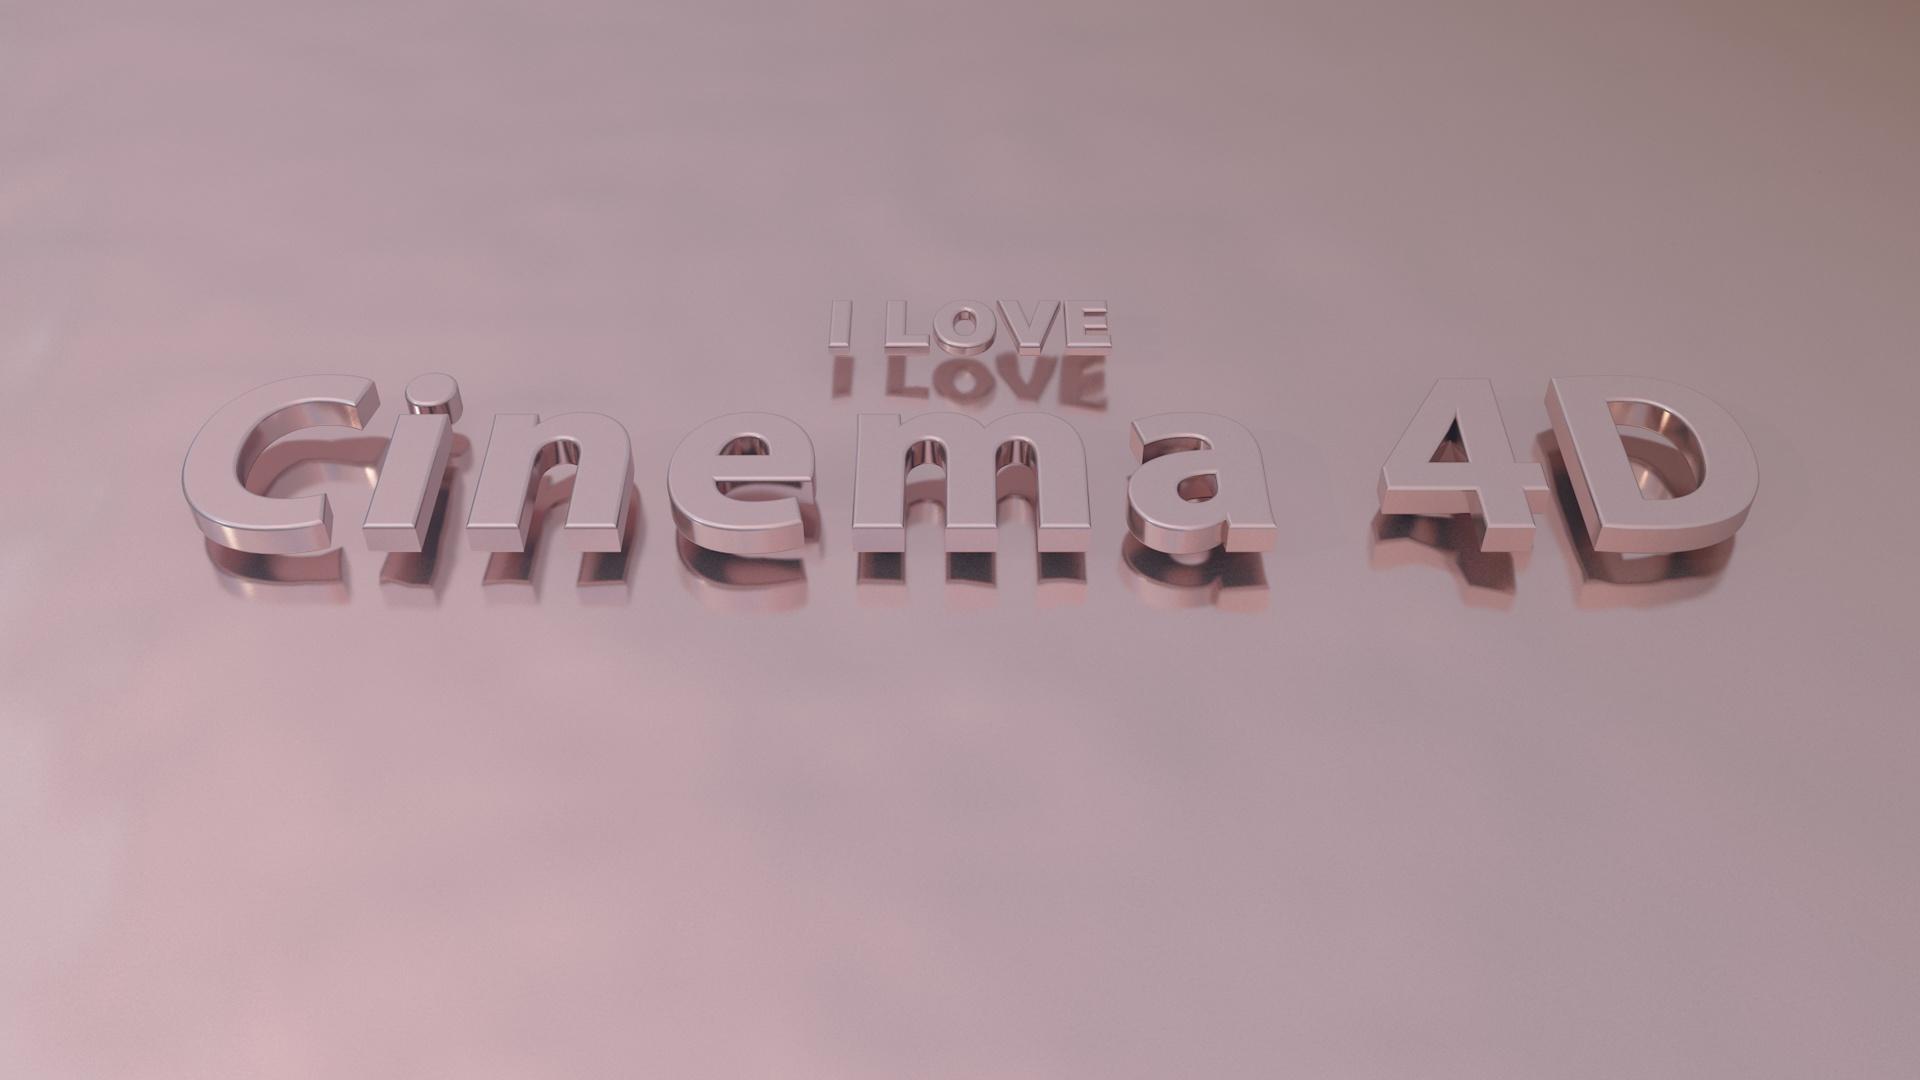 I love Cinema 4D (Cinema 4D Wallpaper) #2 - C4D4U